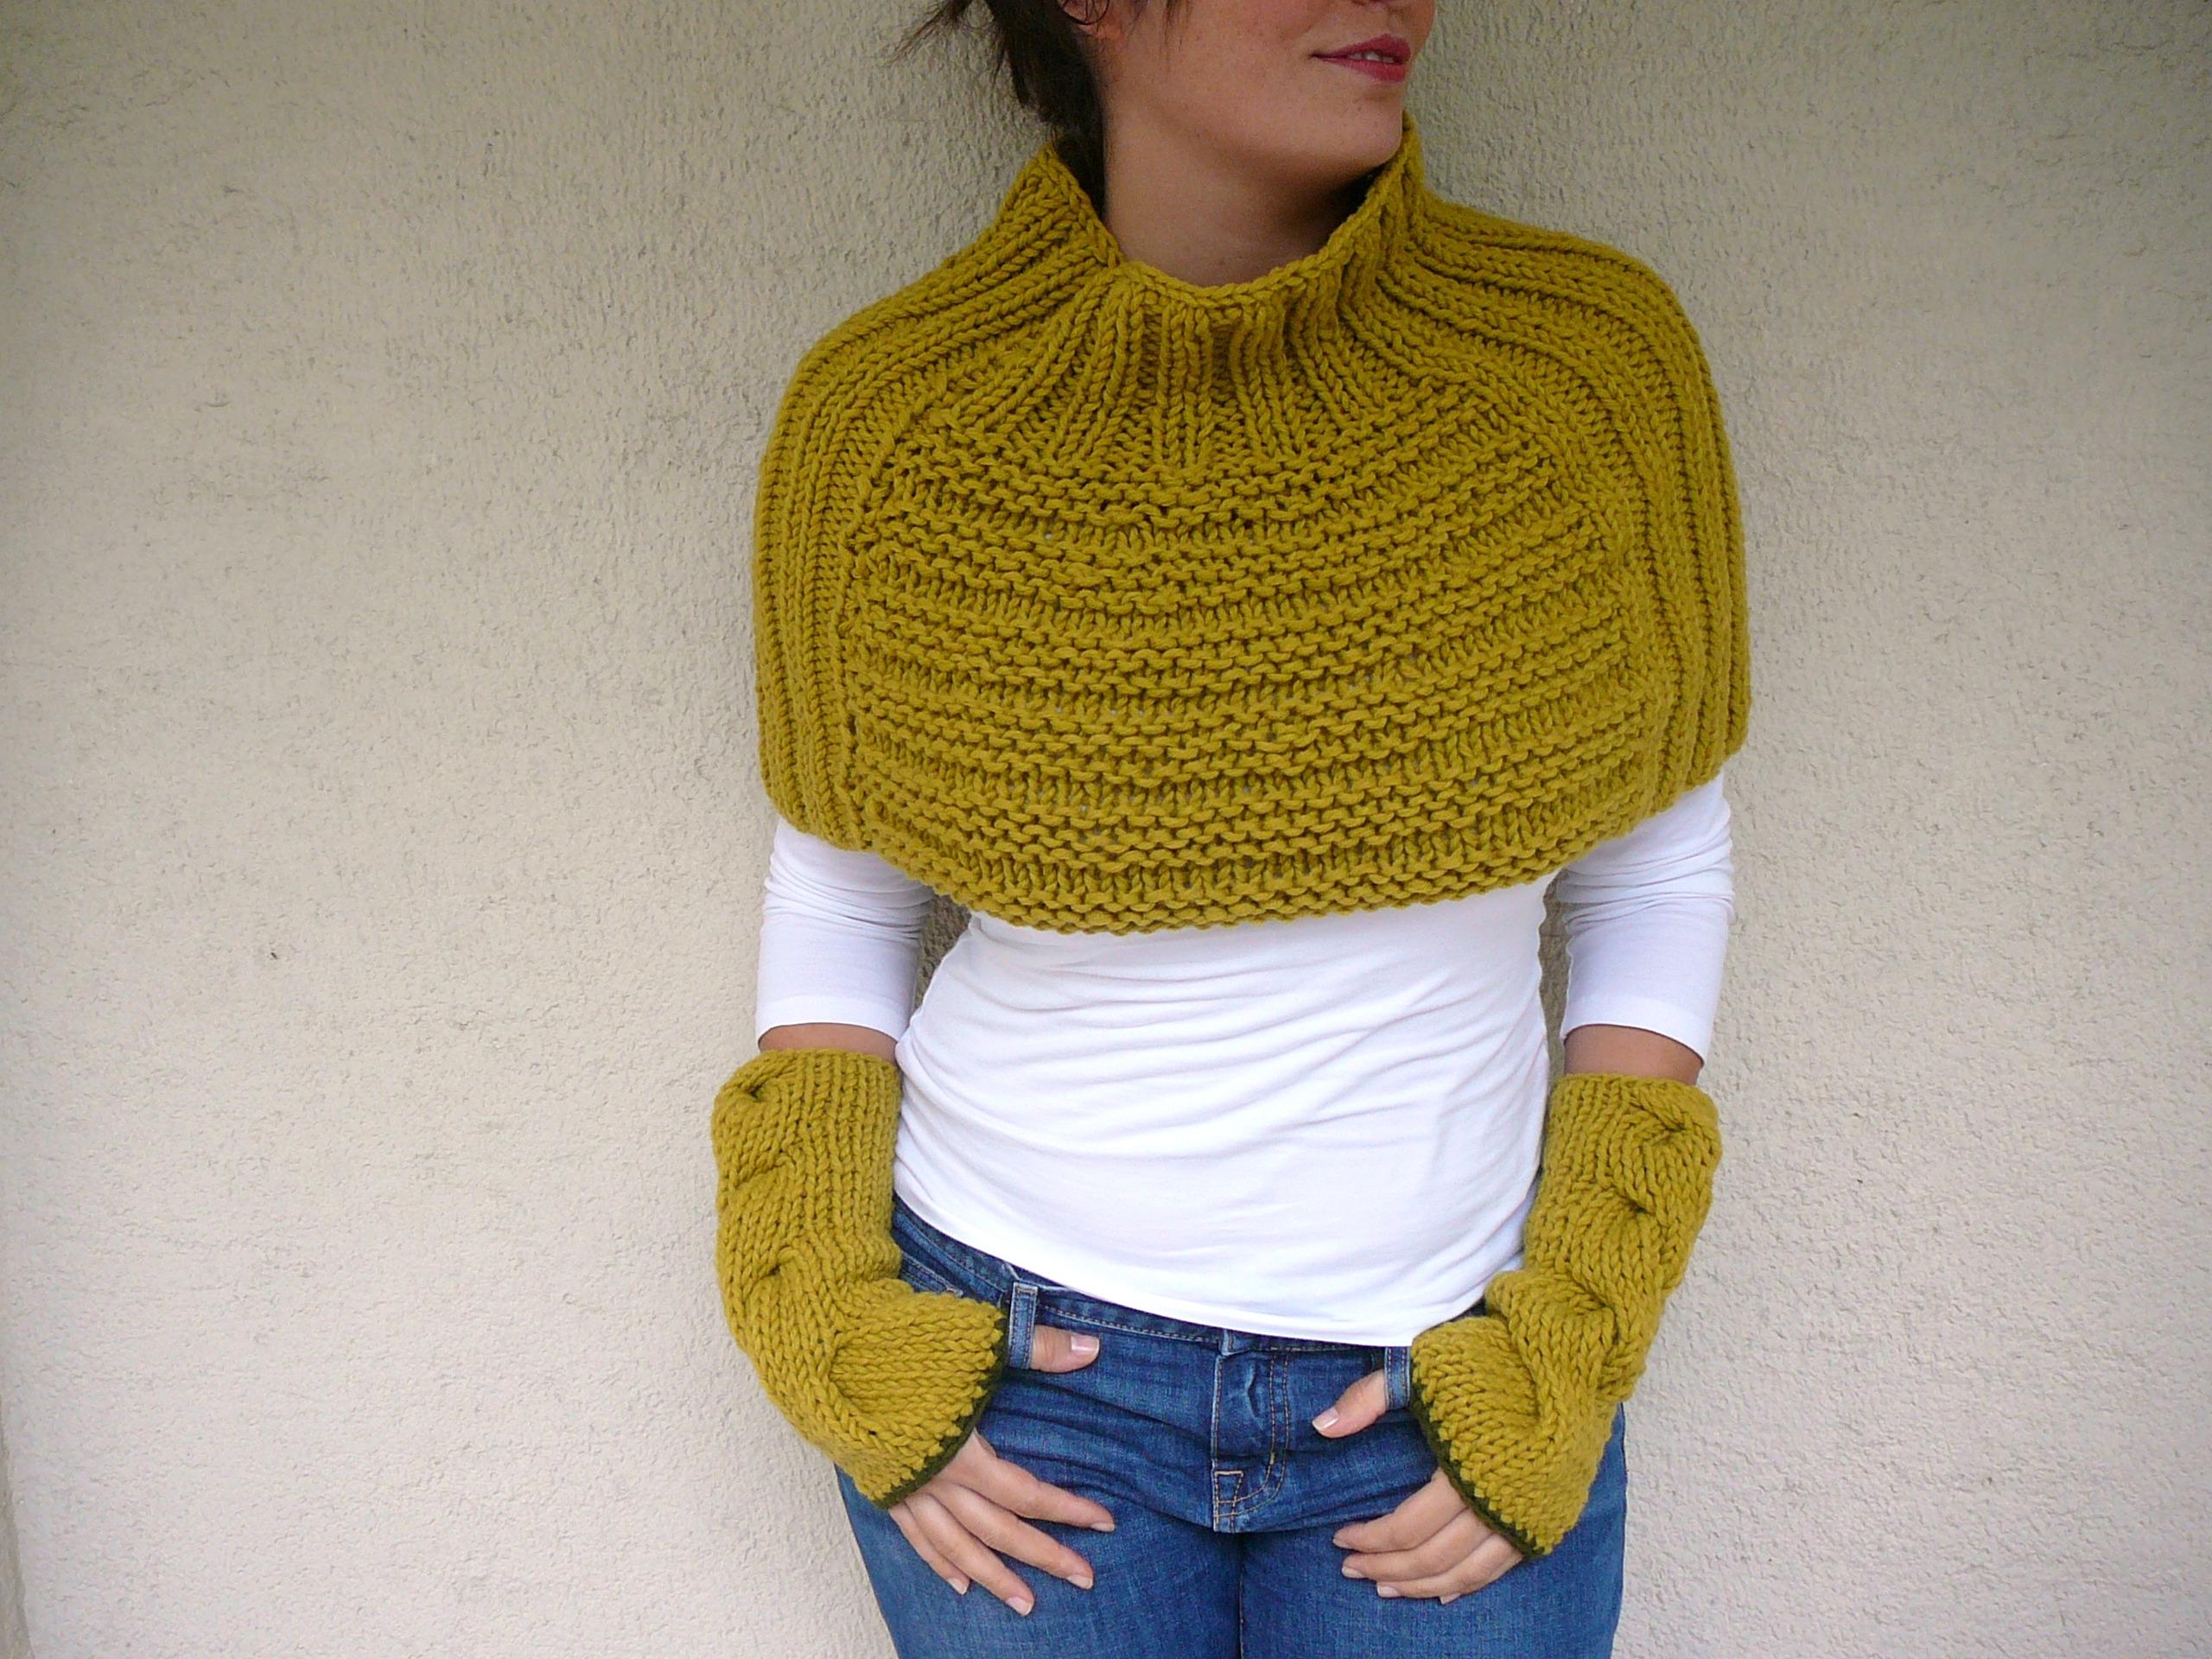 Hintergrundbilder : Winter, Handschuhe, Gelb, Muster, Sweatshirt ...